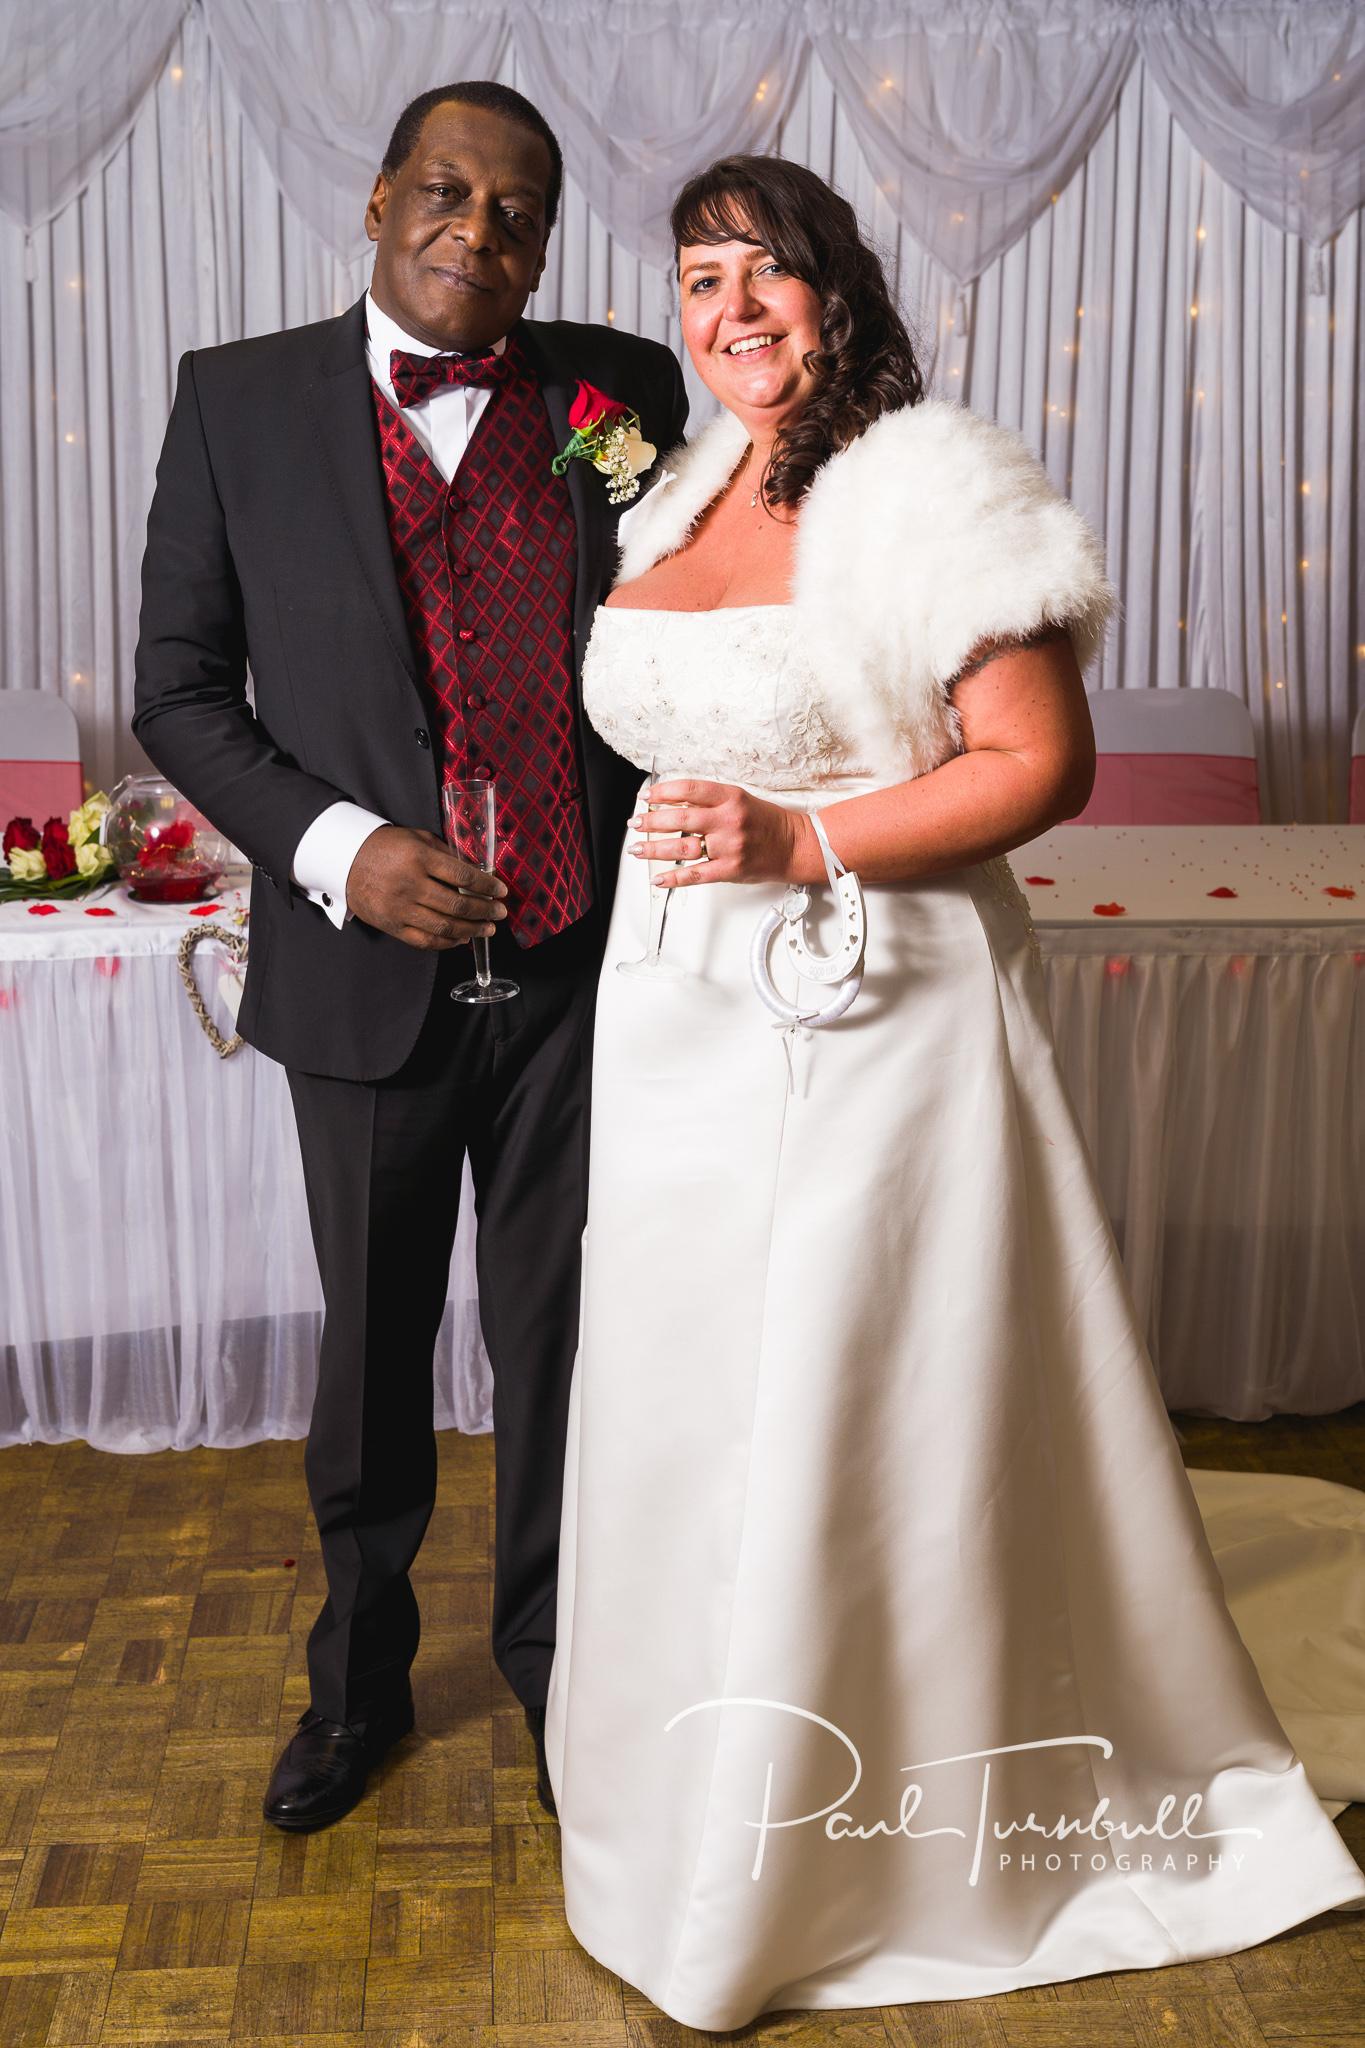 wedding-photographer-leeds-town-hall-033.jpg